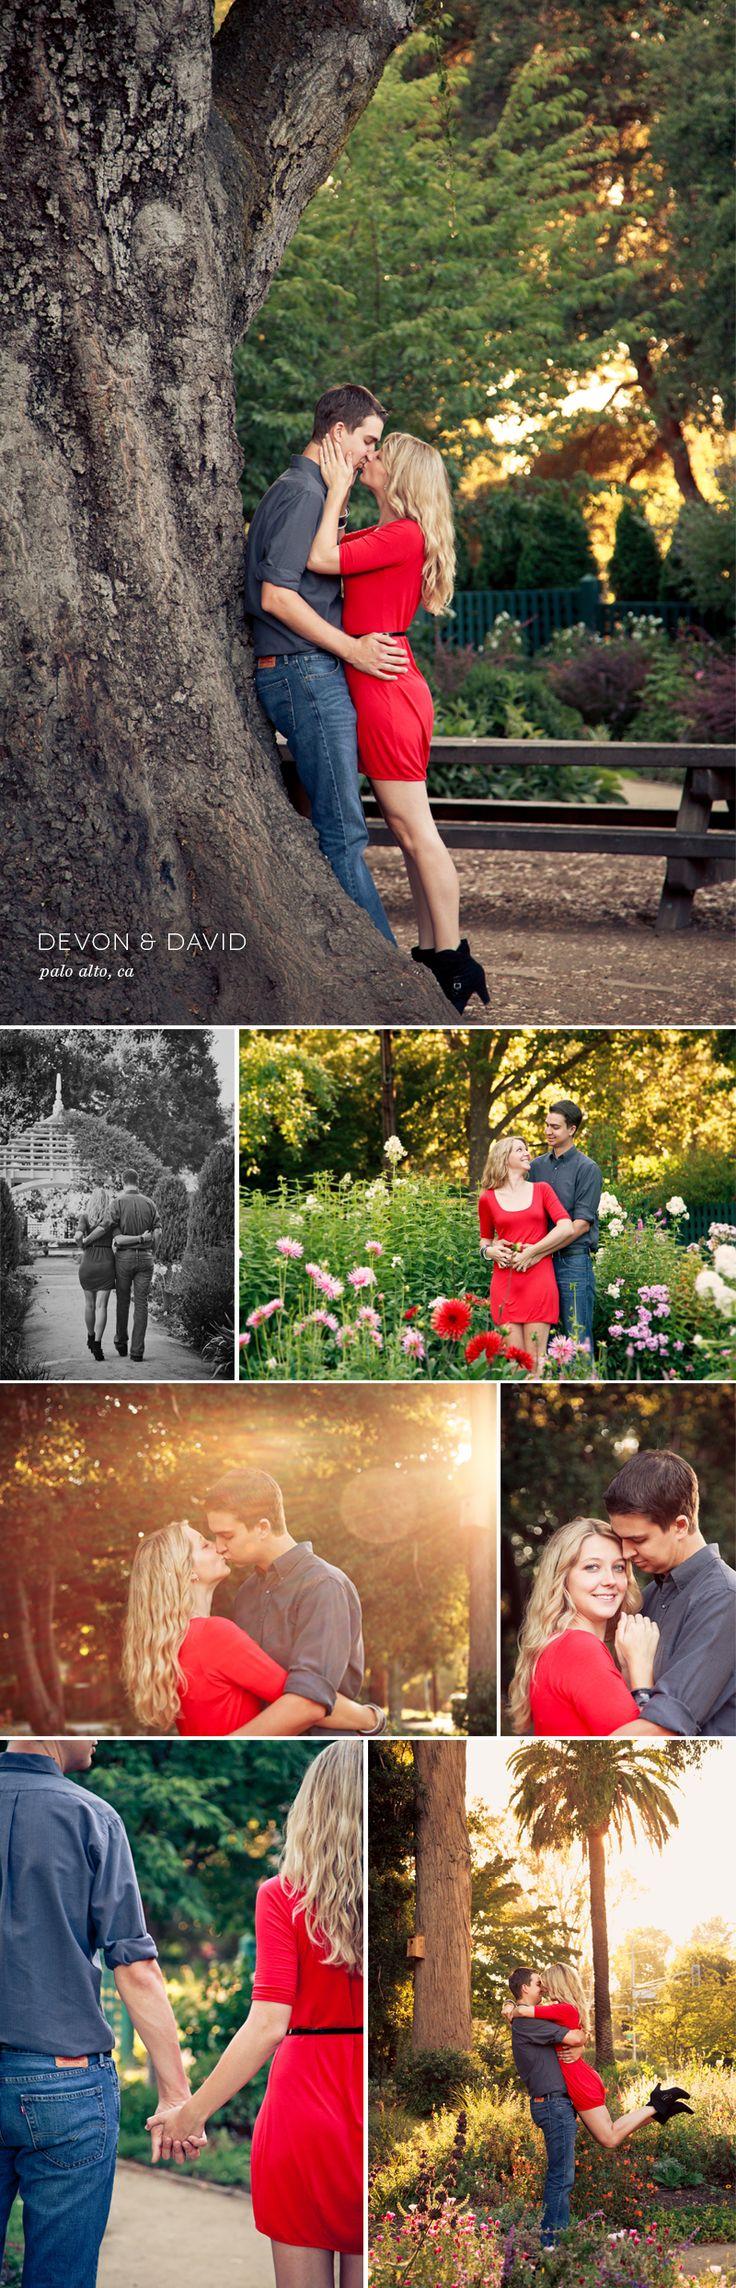 Garden Engagement Photo Session